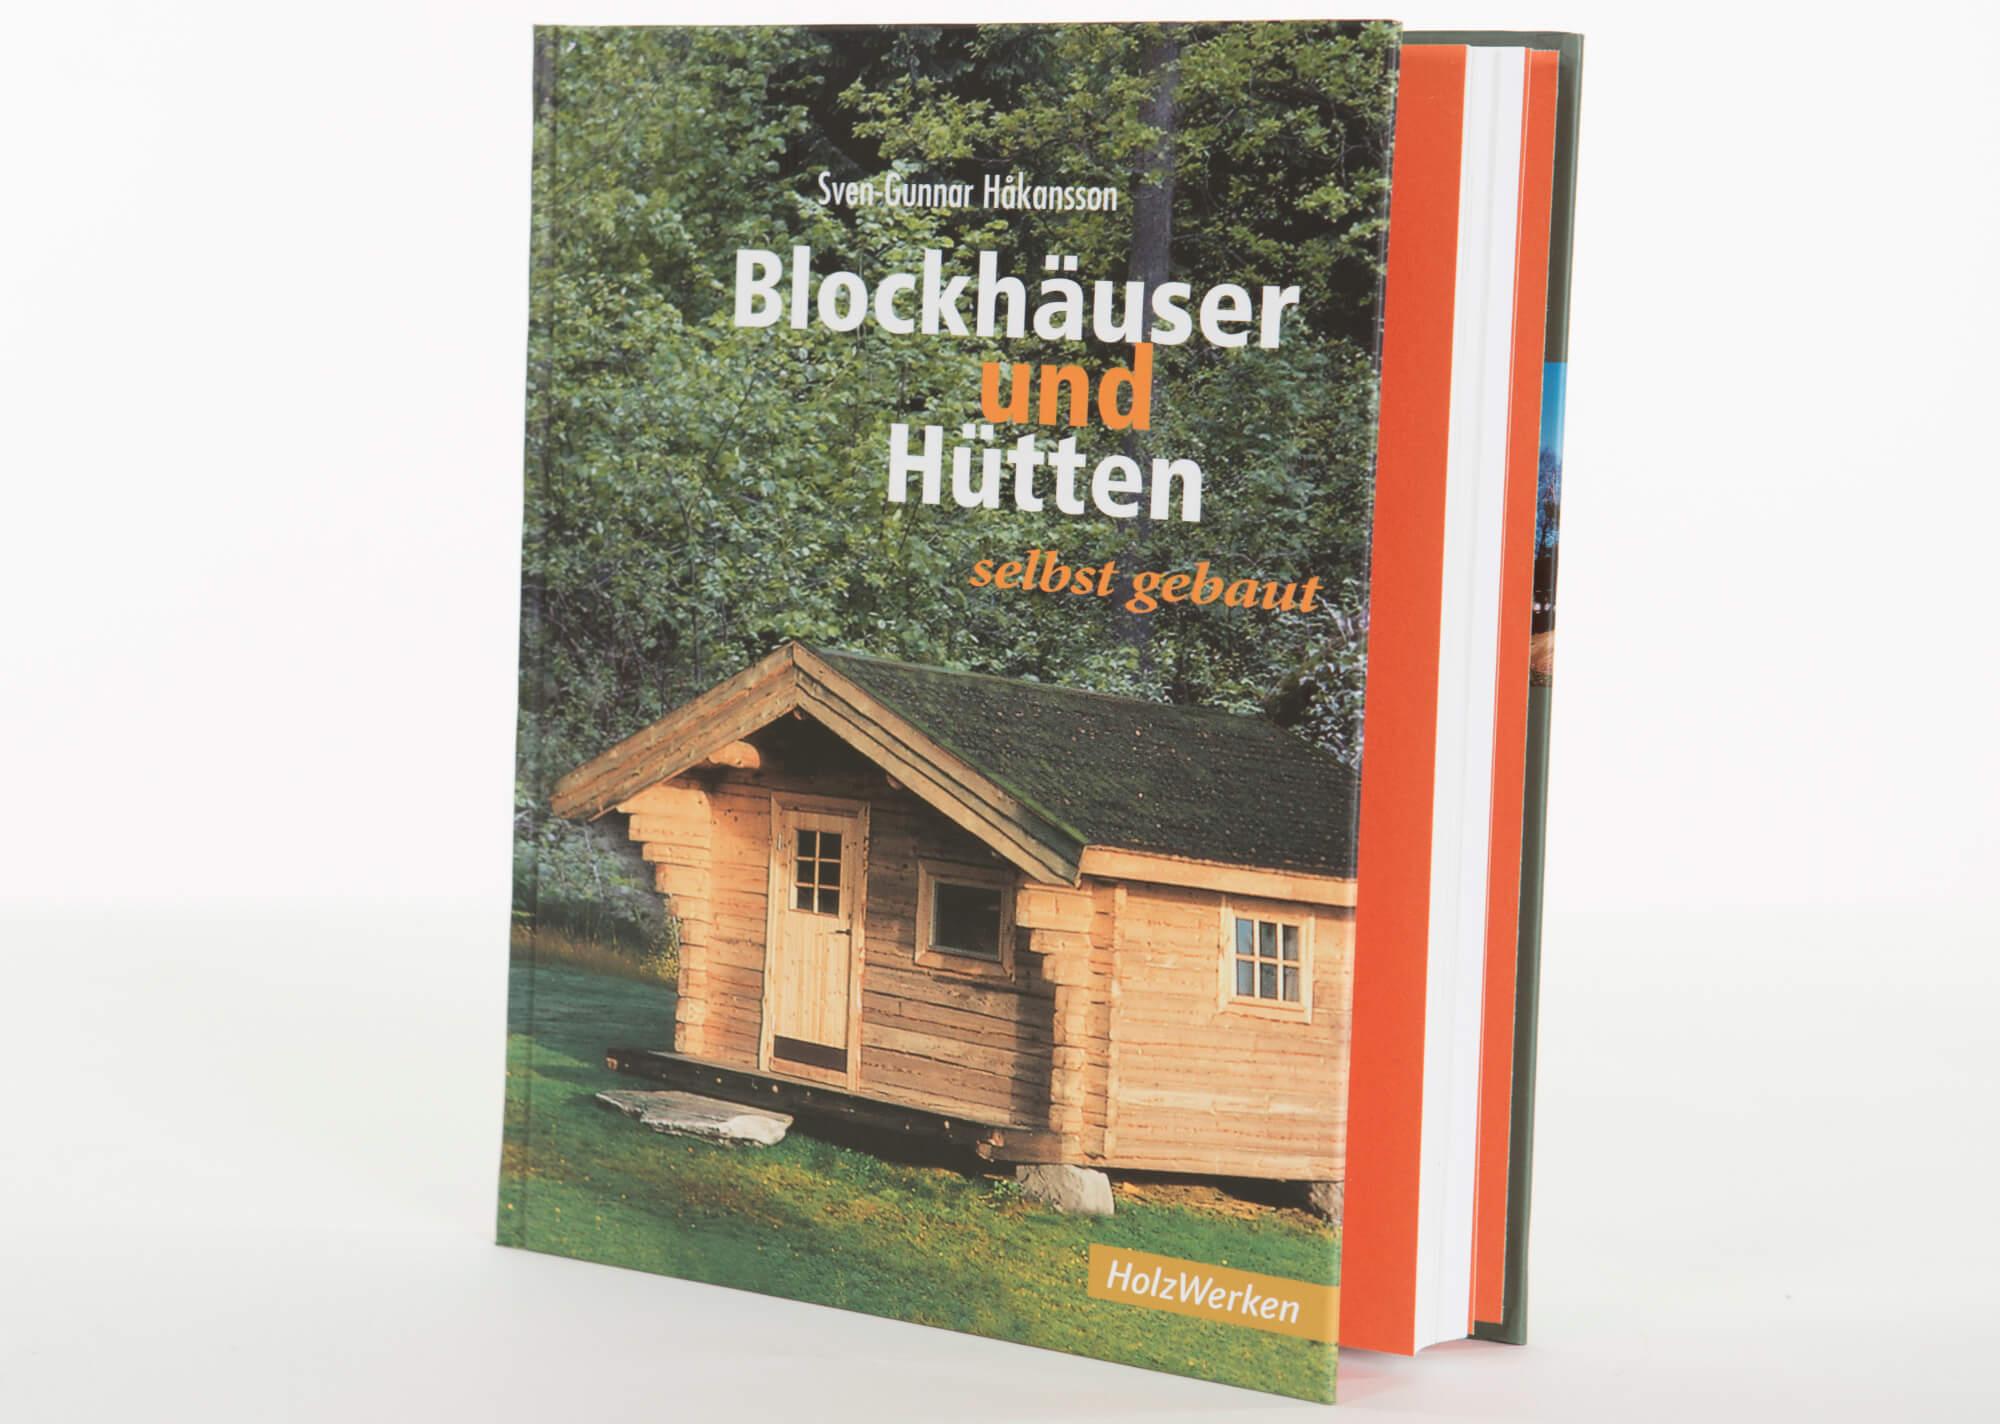 Blockha%3Fuserundhu%3Ftten_1.jpg